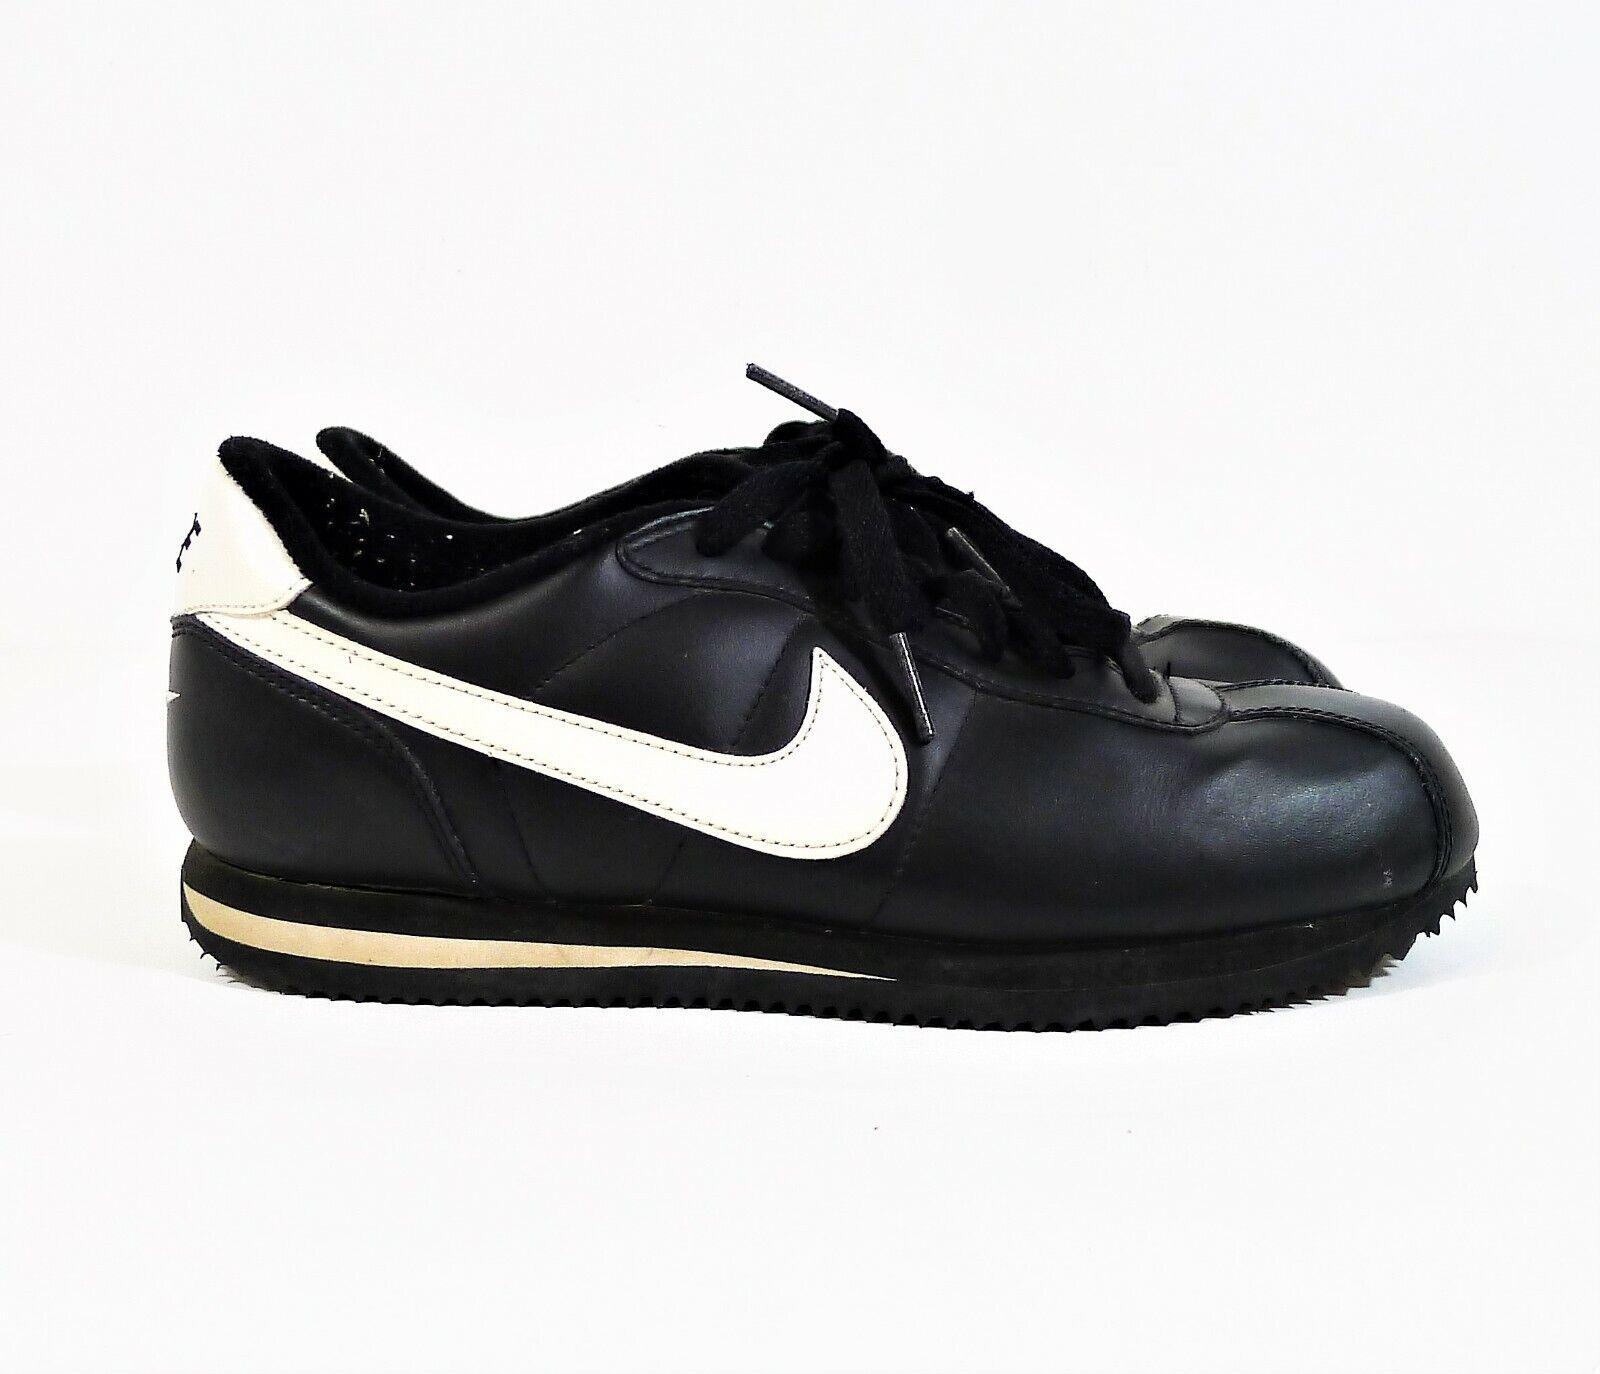 Nike Youth Black/White-Black Cortez GS